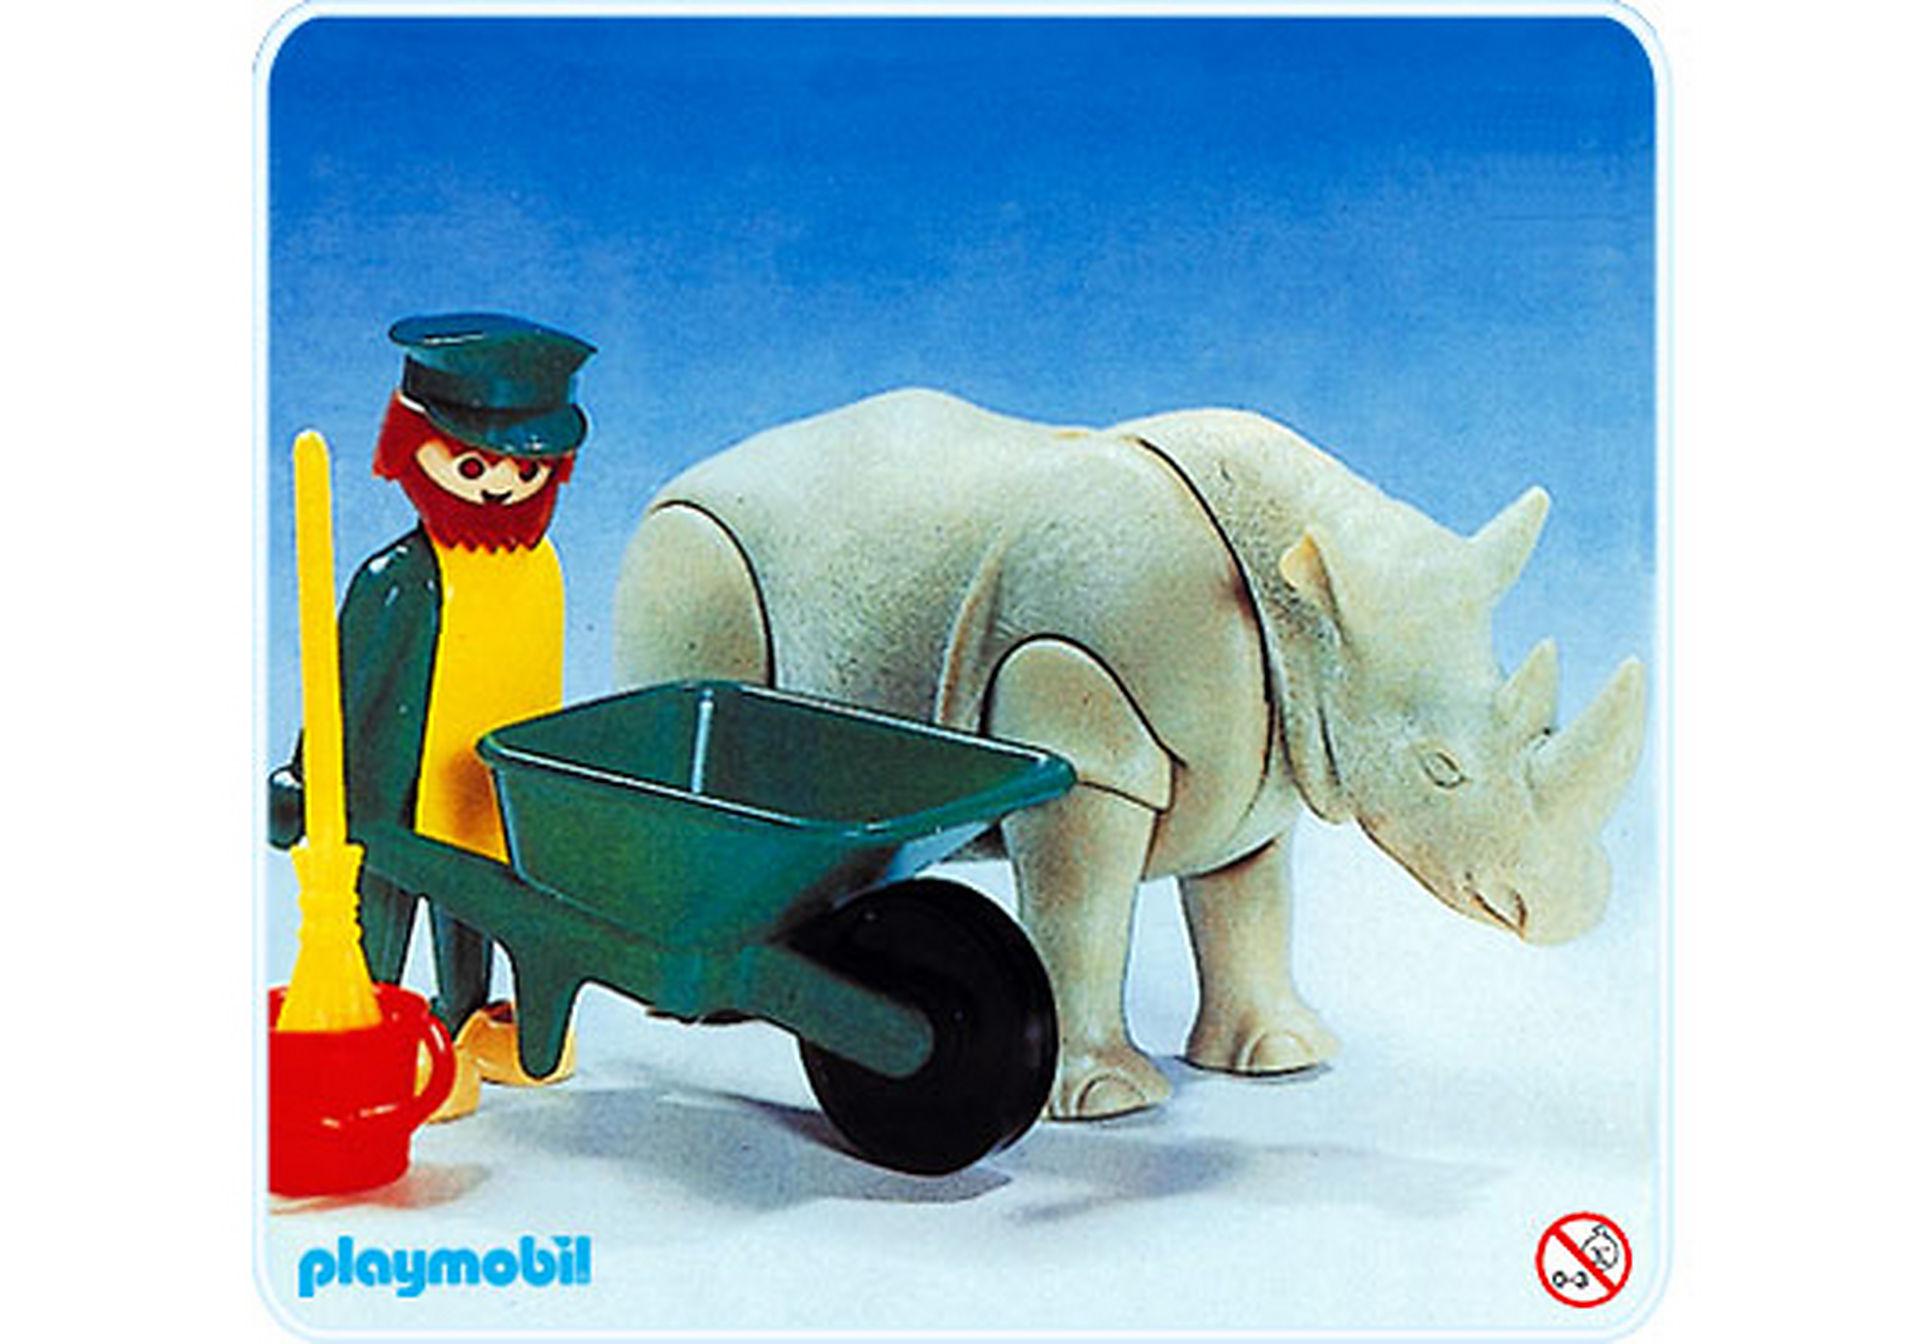 http://media.playmobil.com/i/playmobil/3516-A_product_detail/Tierwärter/Rhinozeros